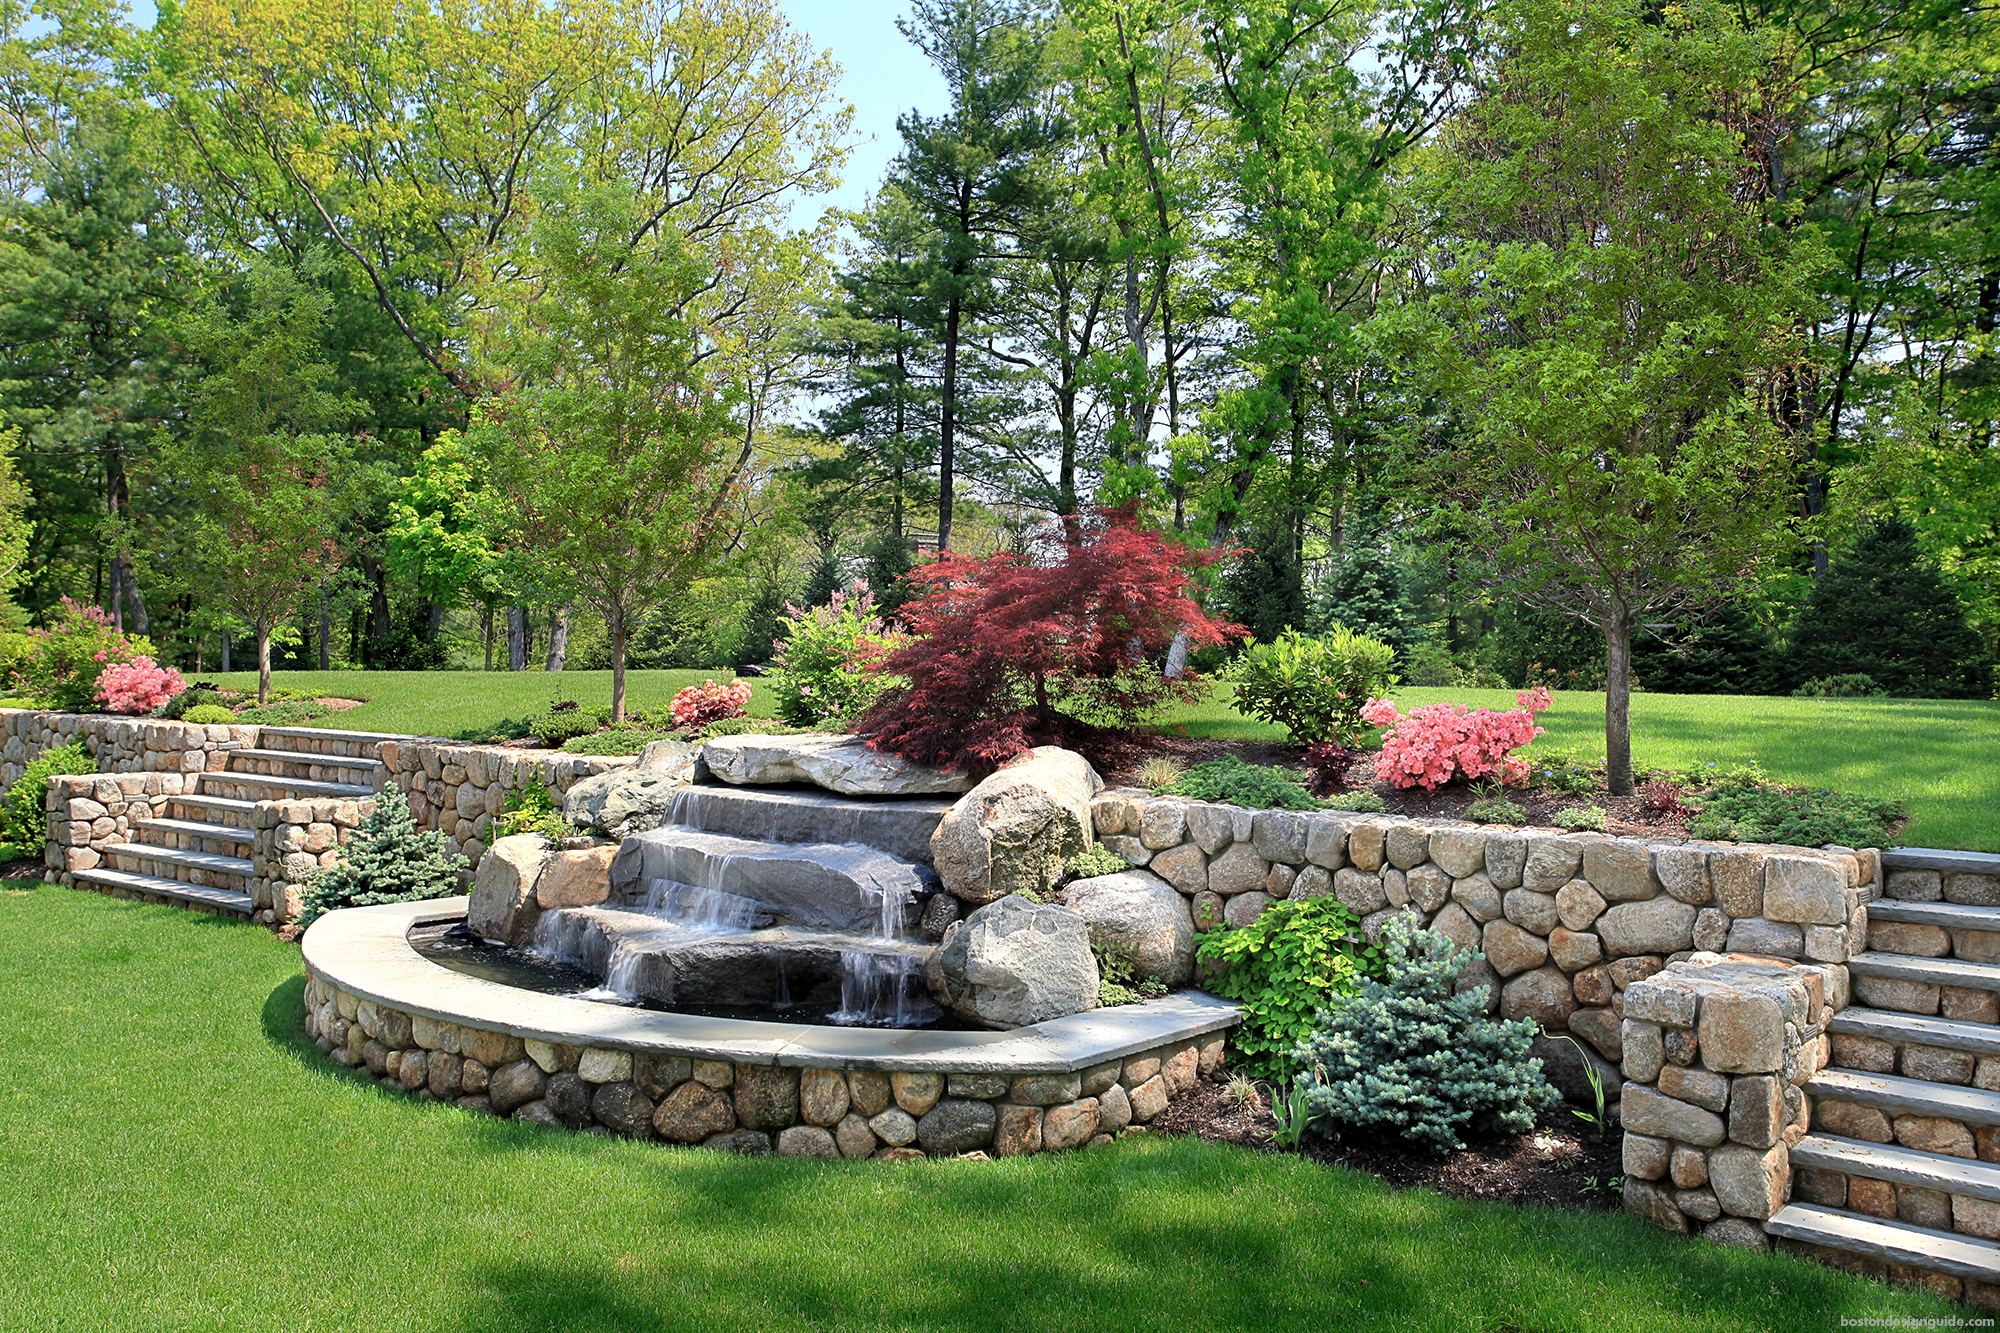 Home Landscape Architecture and design services